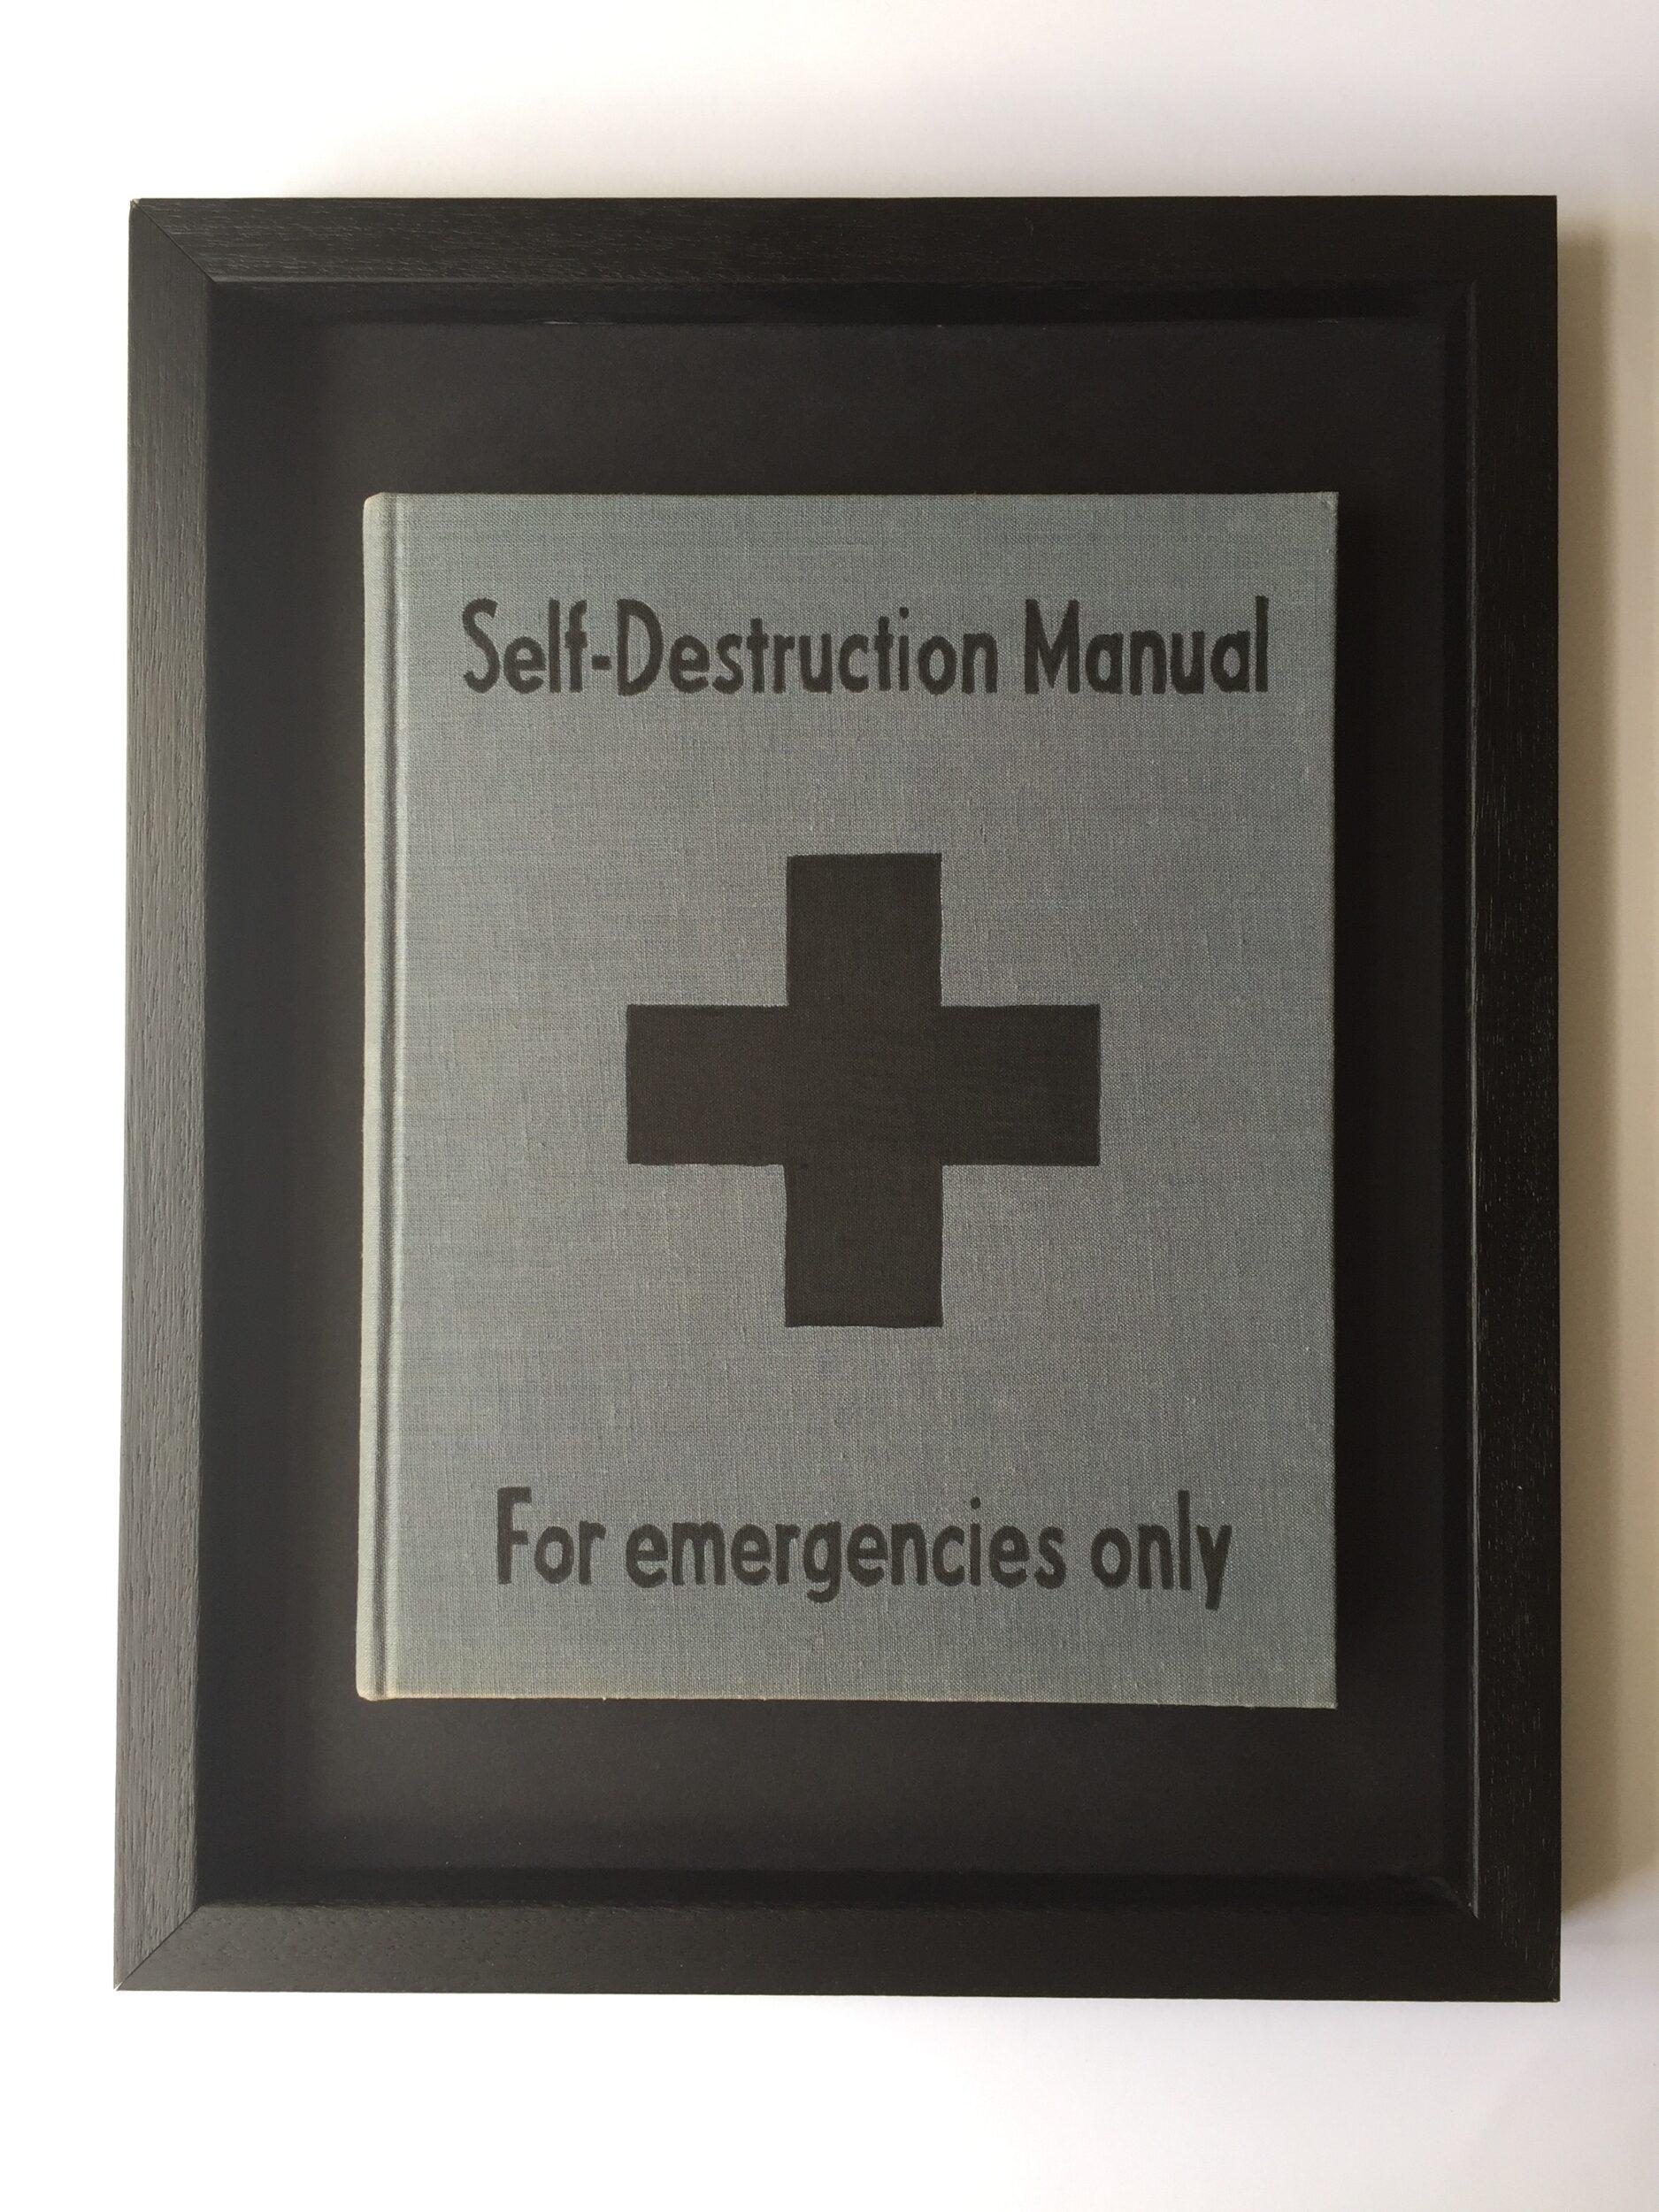 Self-Destruction Manual